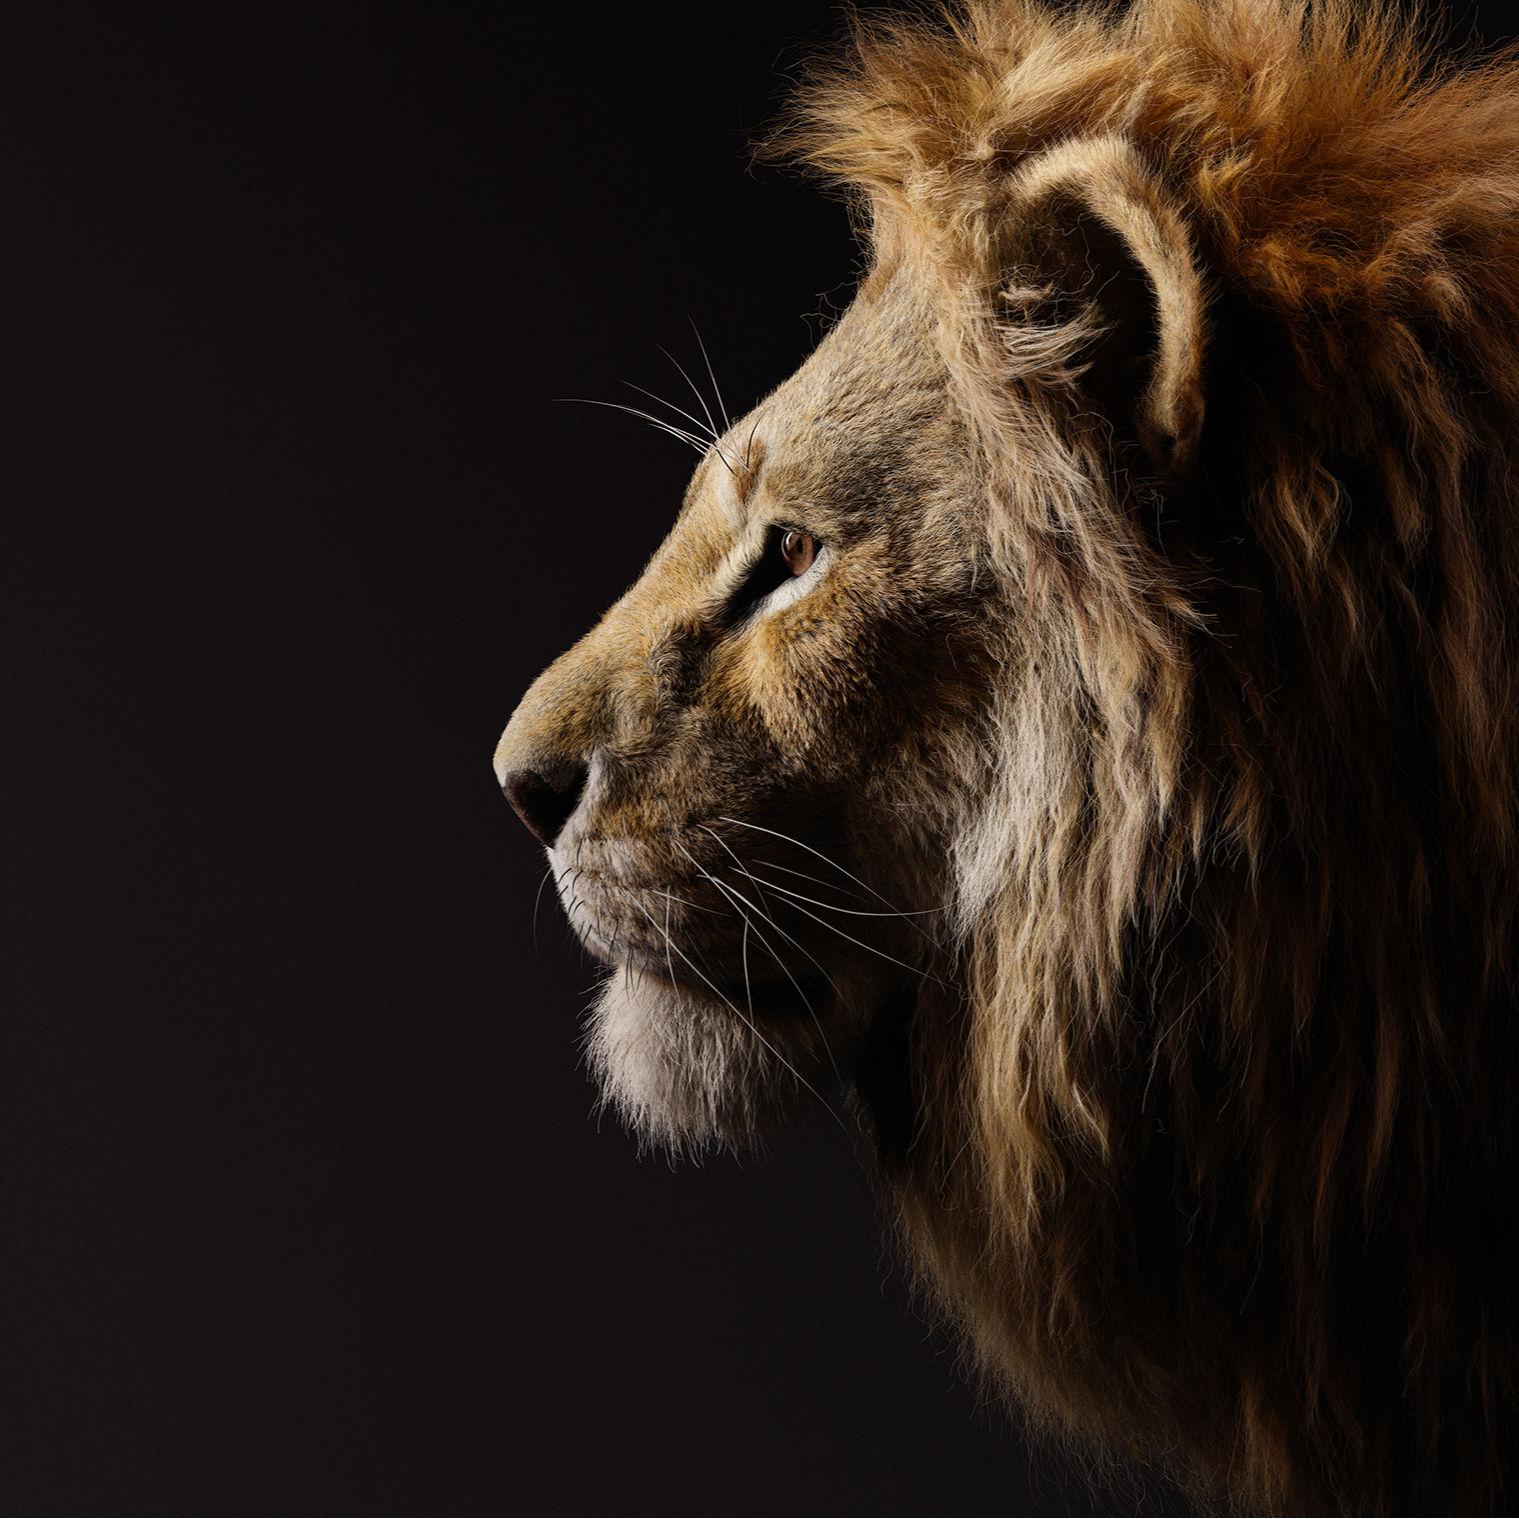 Stunning Lion King Photos